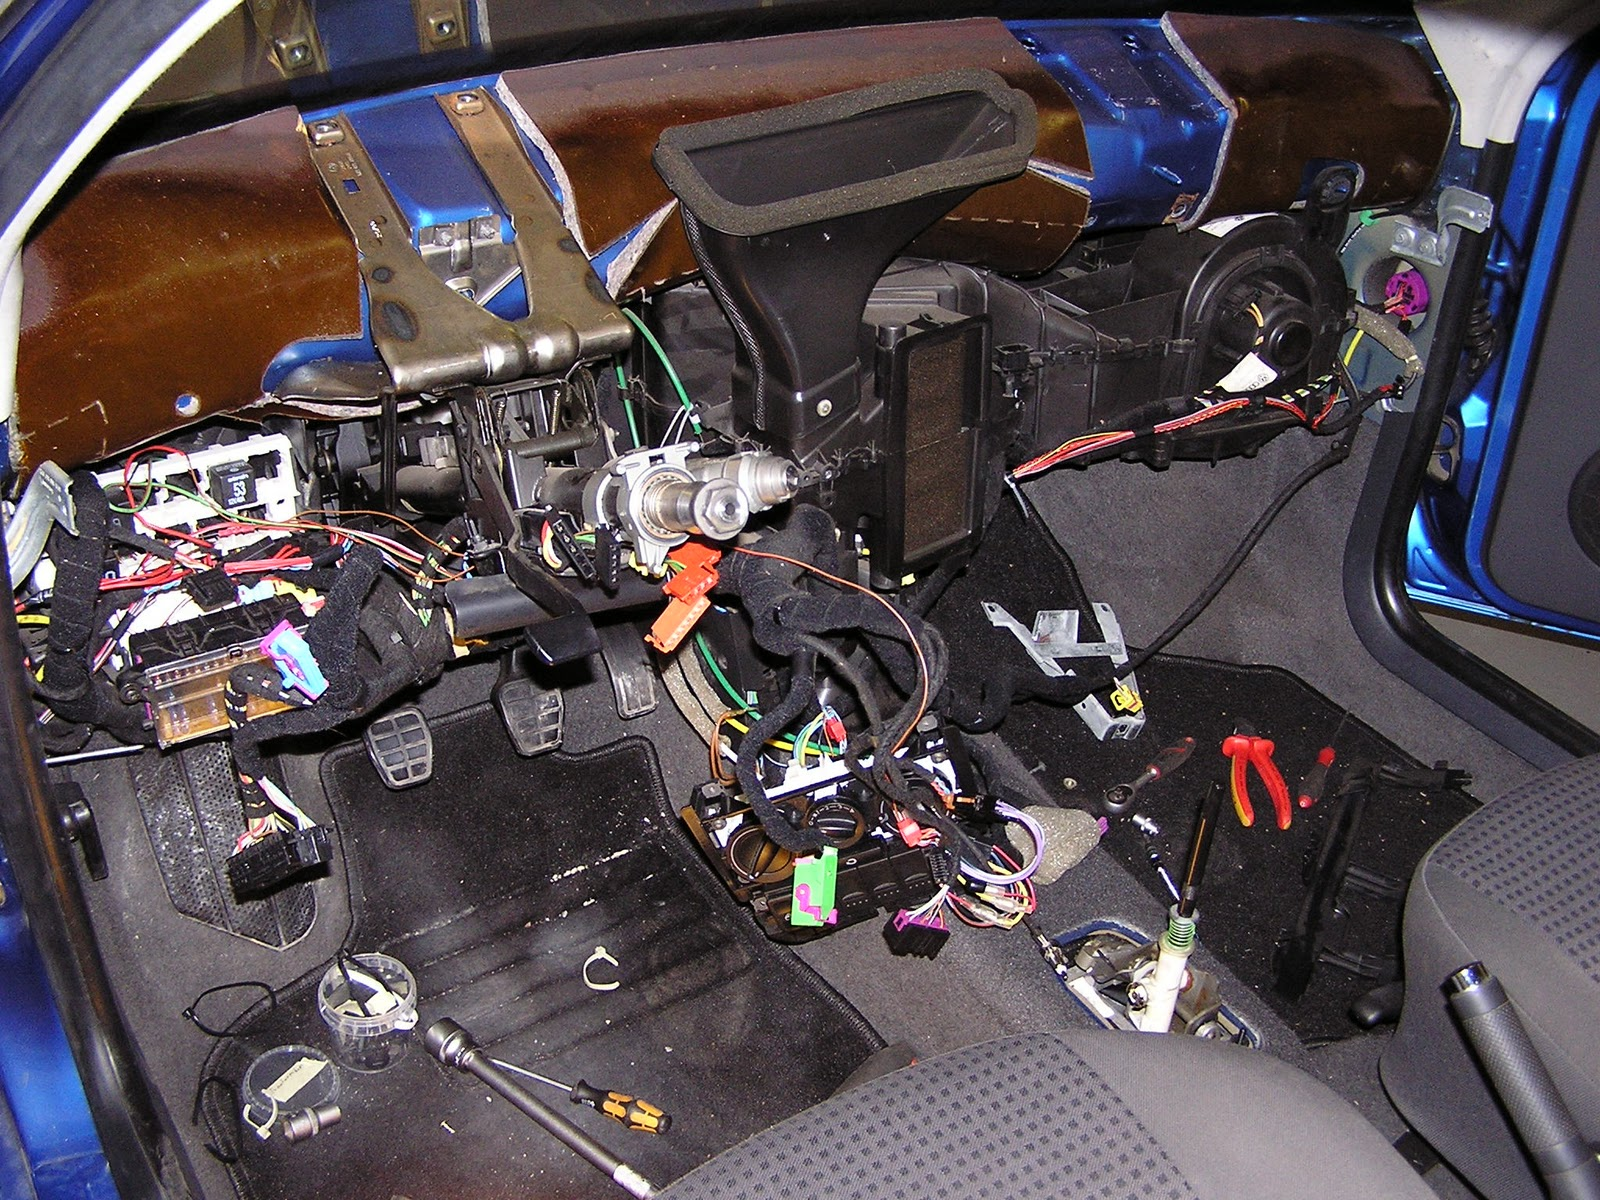 Zpm Zero Polo Mobil - Elektro Vw Polo: Heizung, Batteriemonitor Und